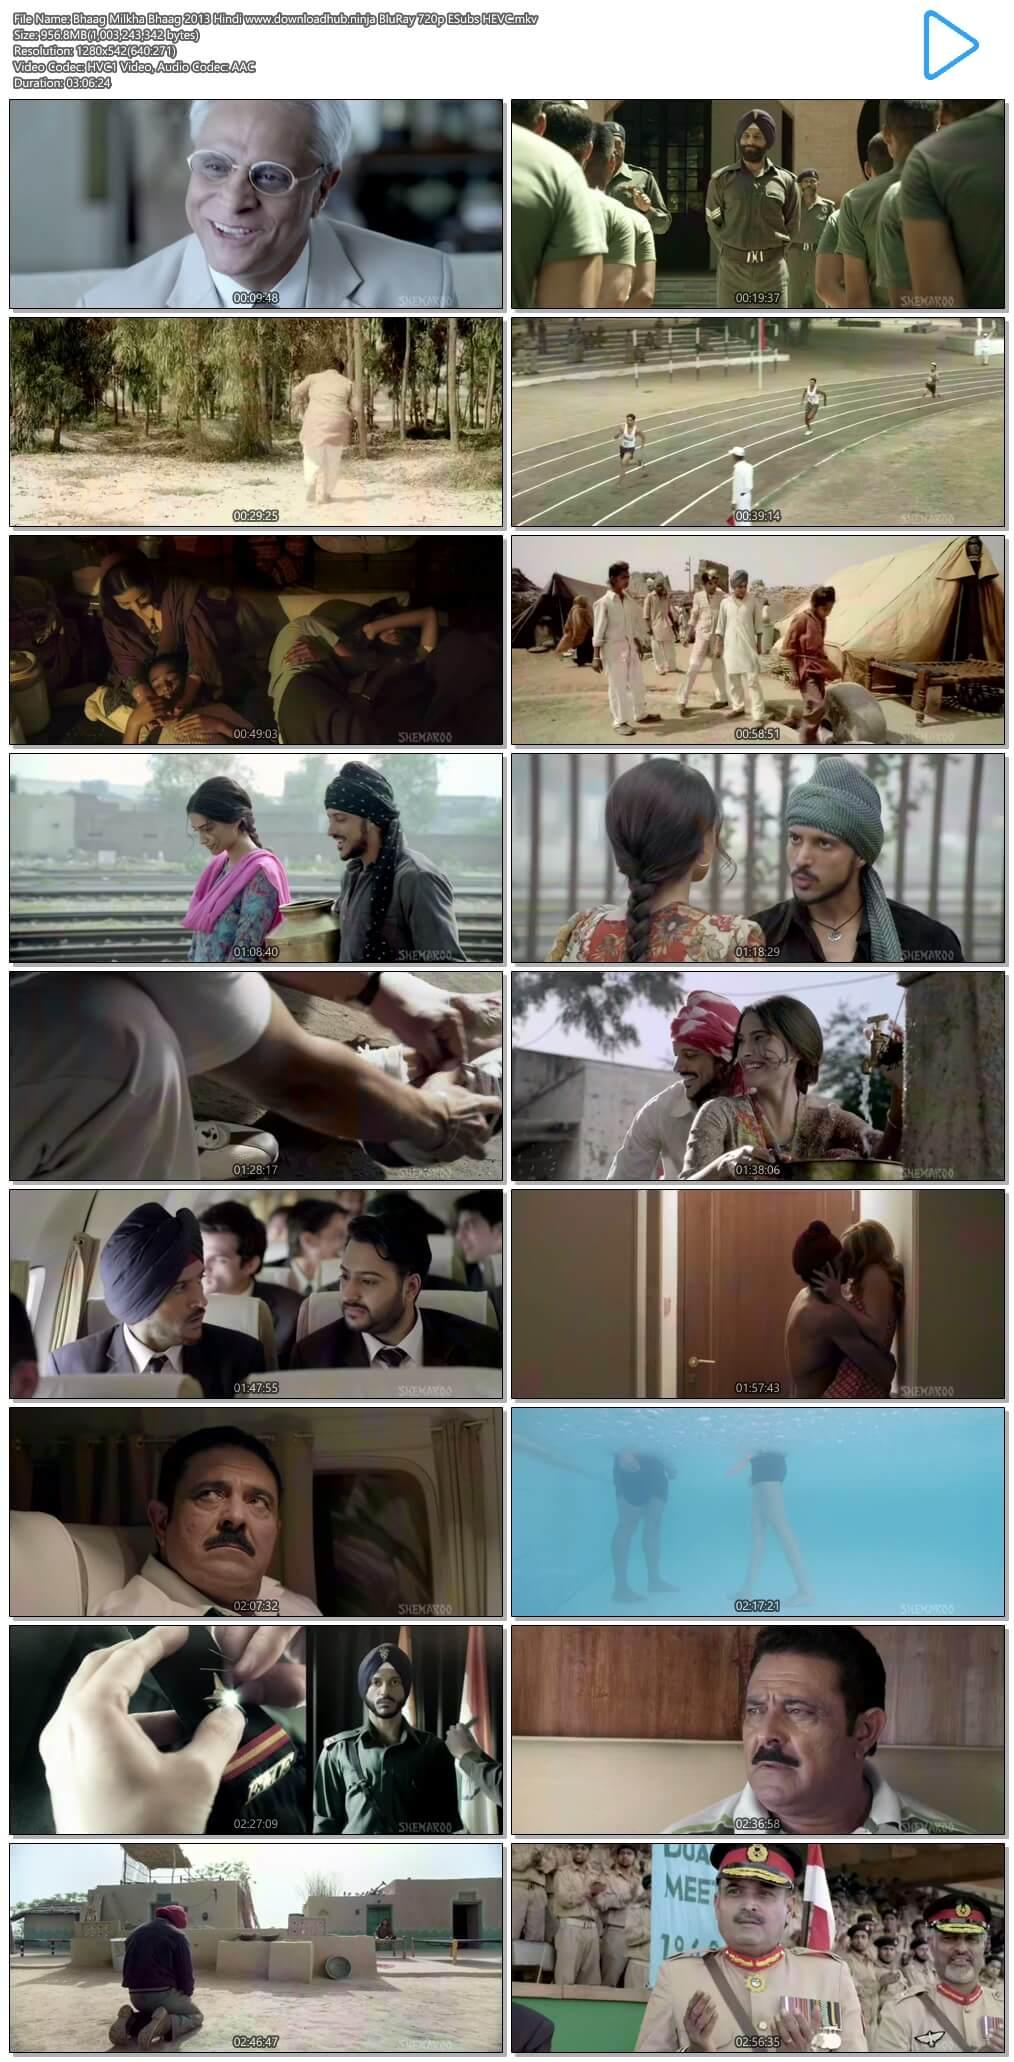 Bhaag Milkha Bhaag 2013 Hindi 950MB BluRay 720p ESubs HEVC